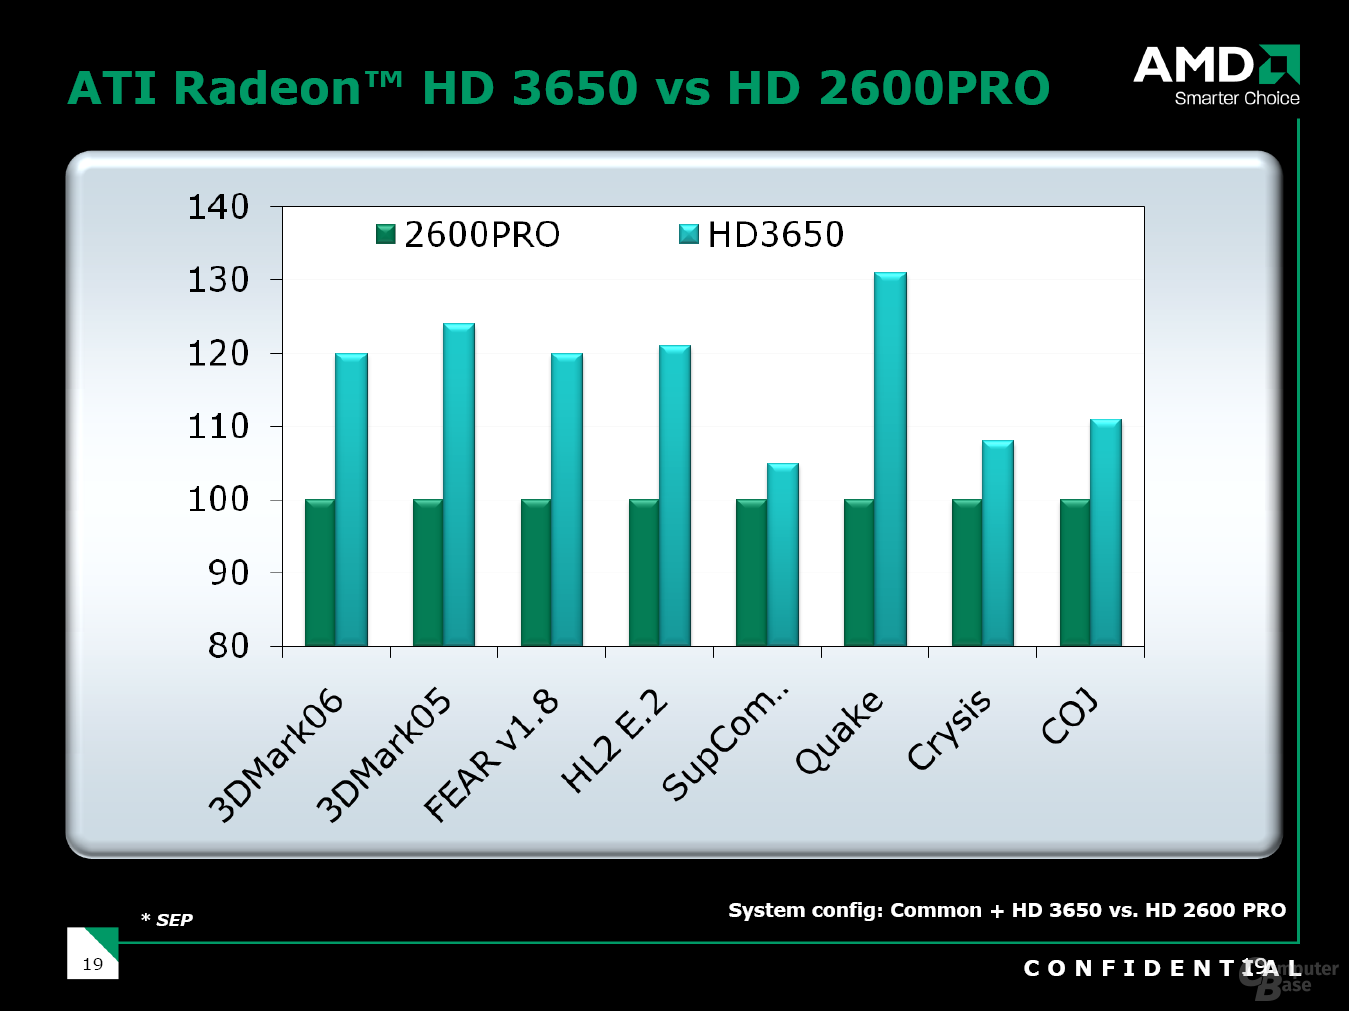 Radeon HD 3650 Performance